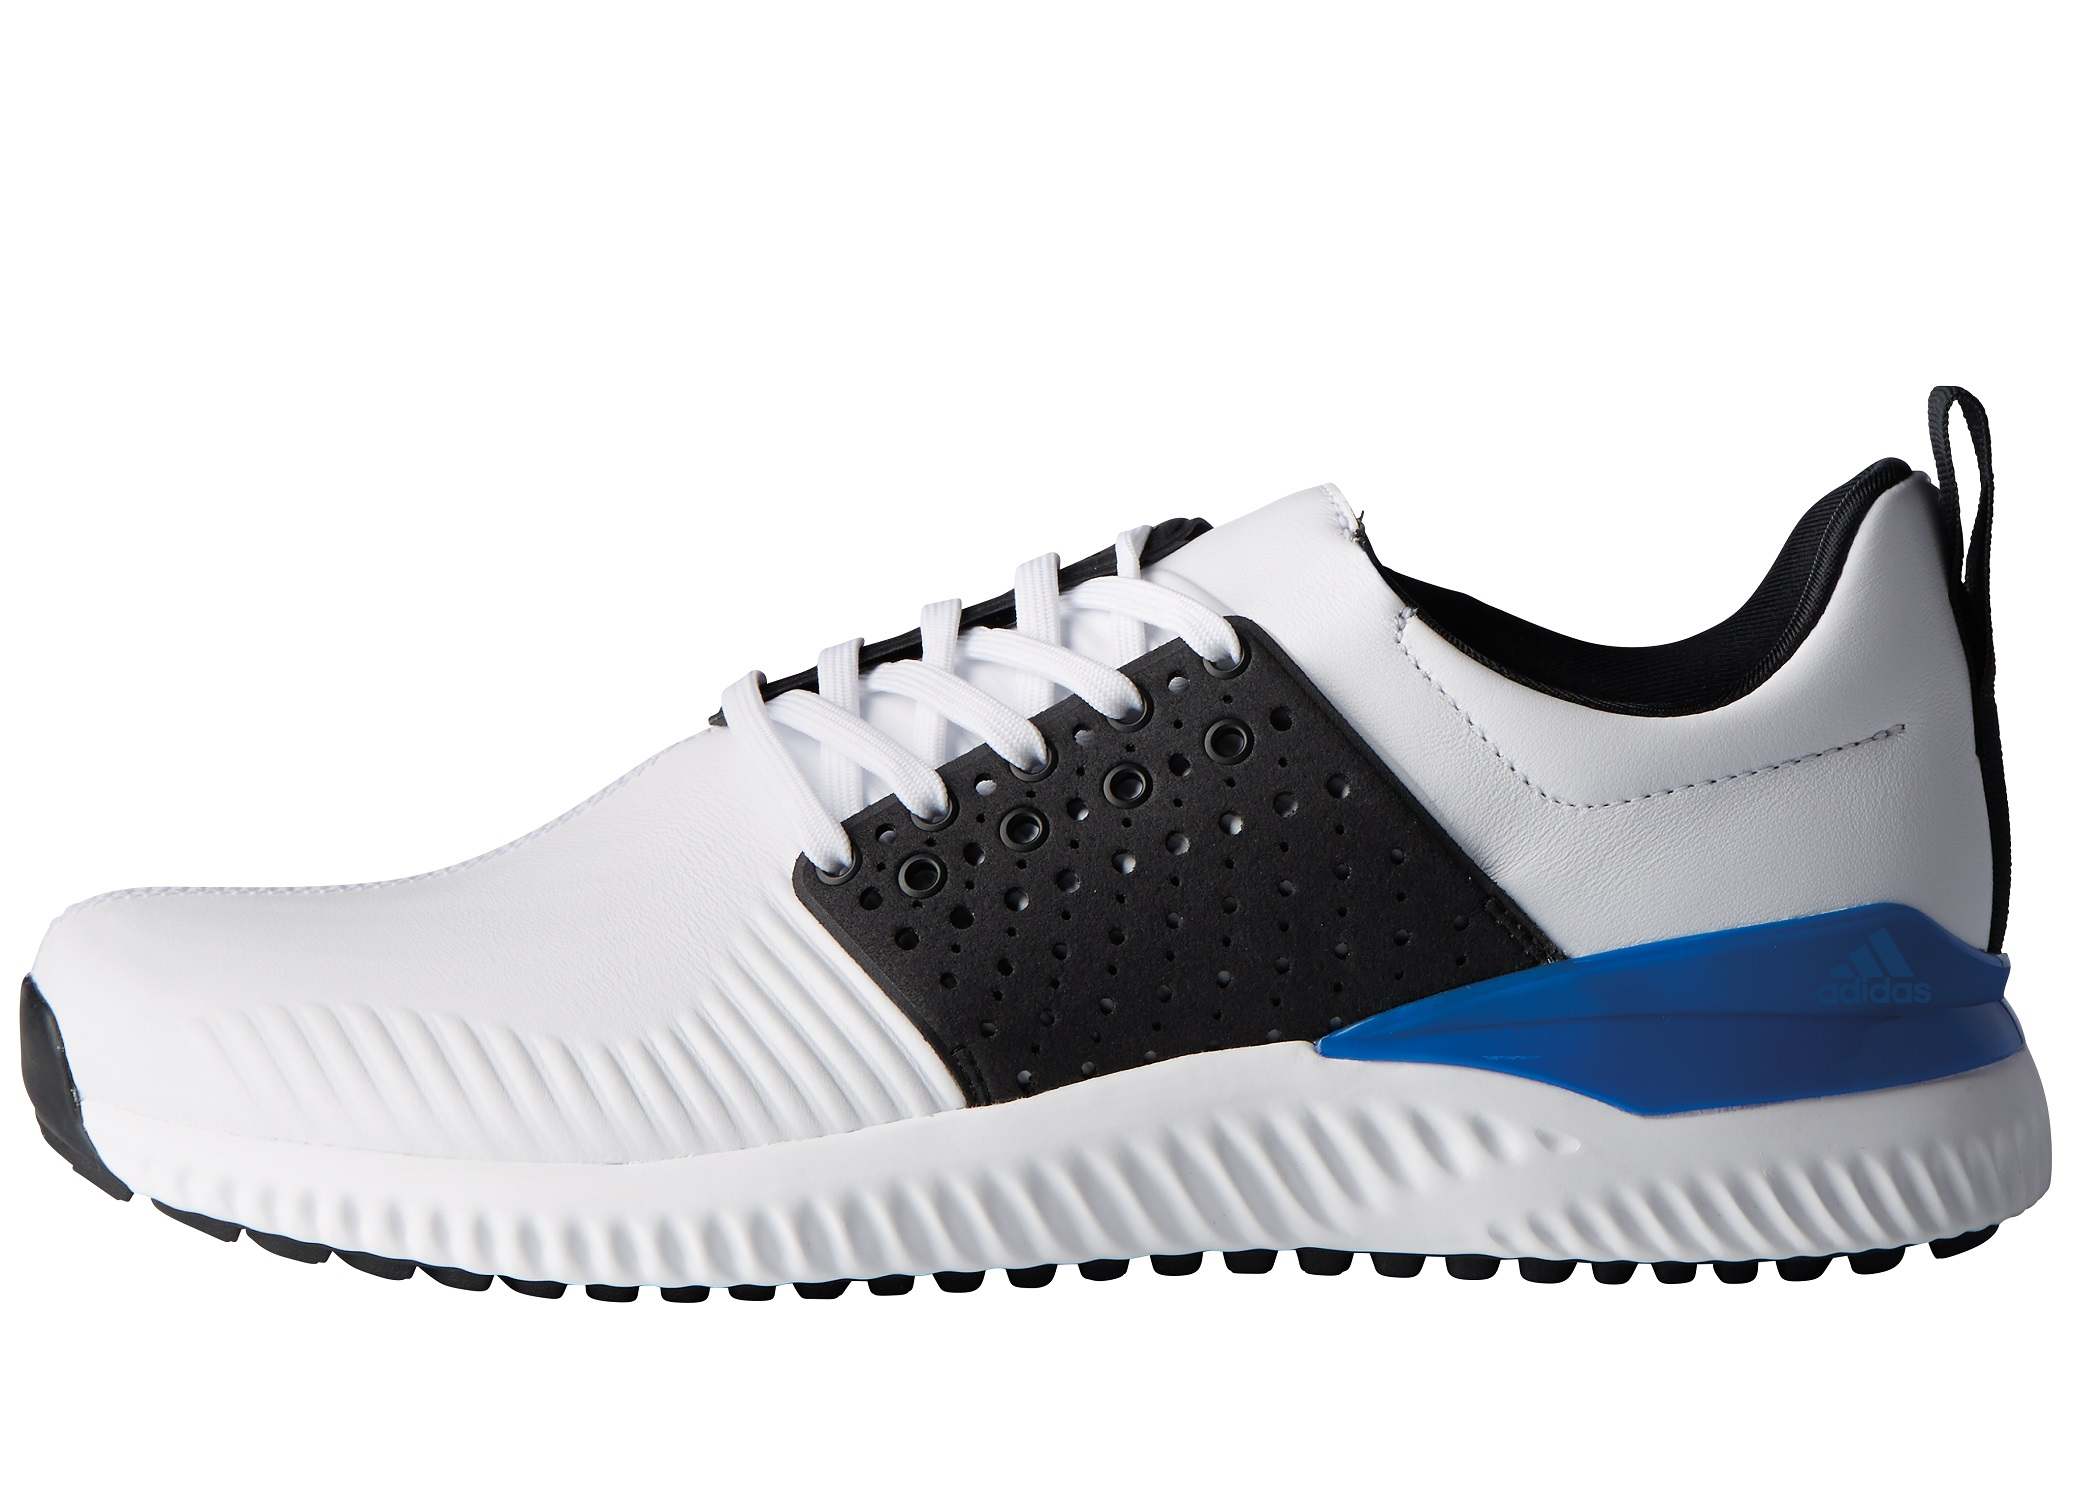 best service cbed8 53d5c Adidas Golf- Adicross Bounce Shoes